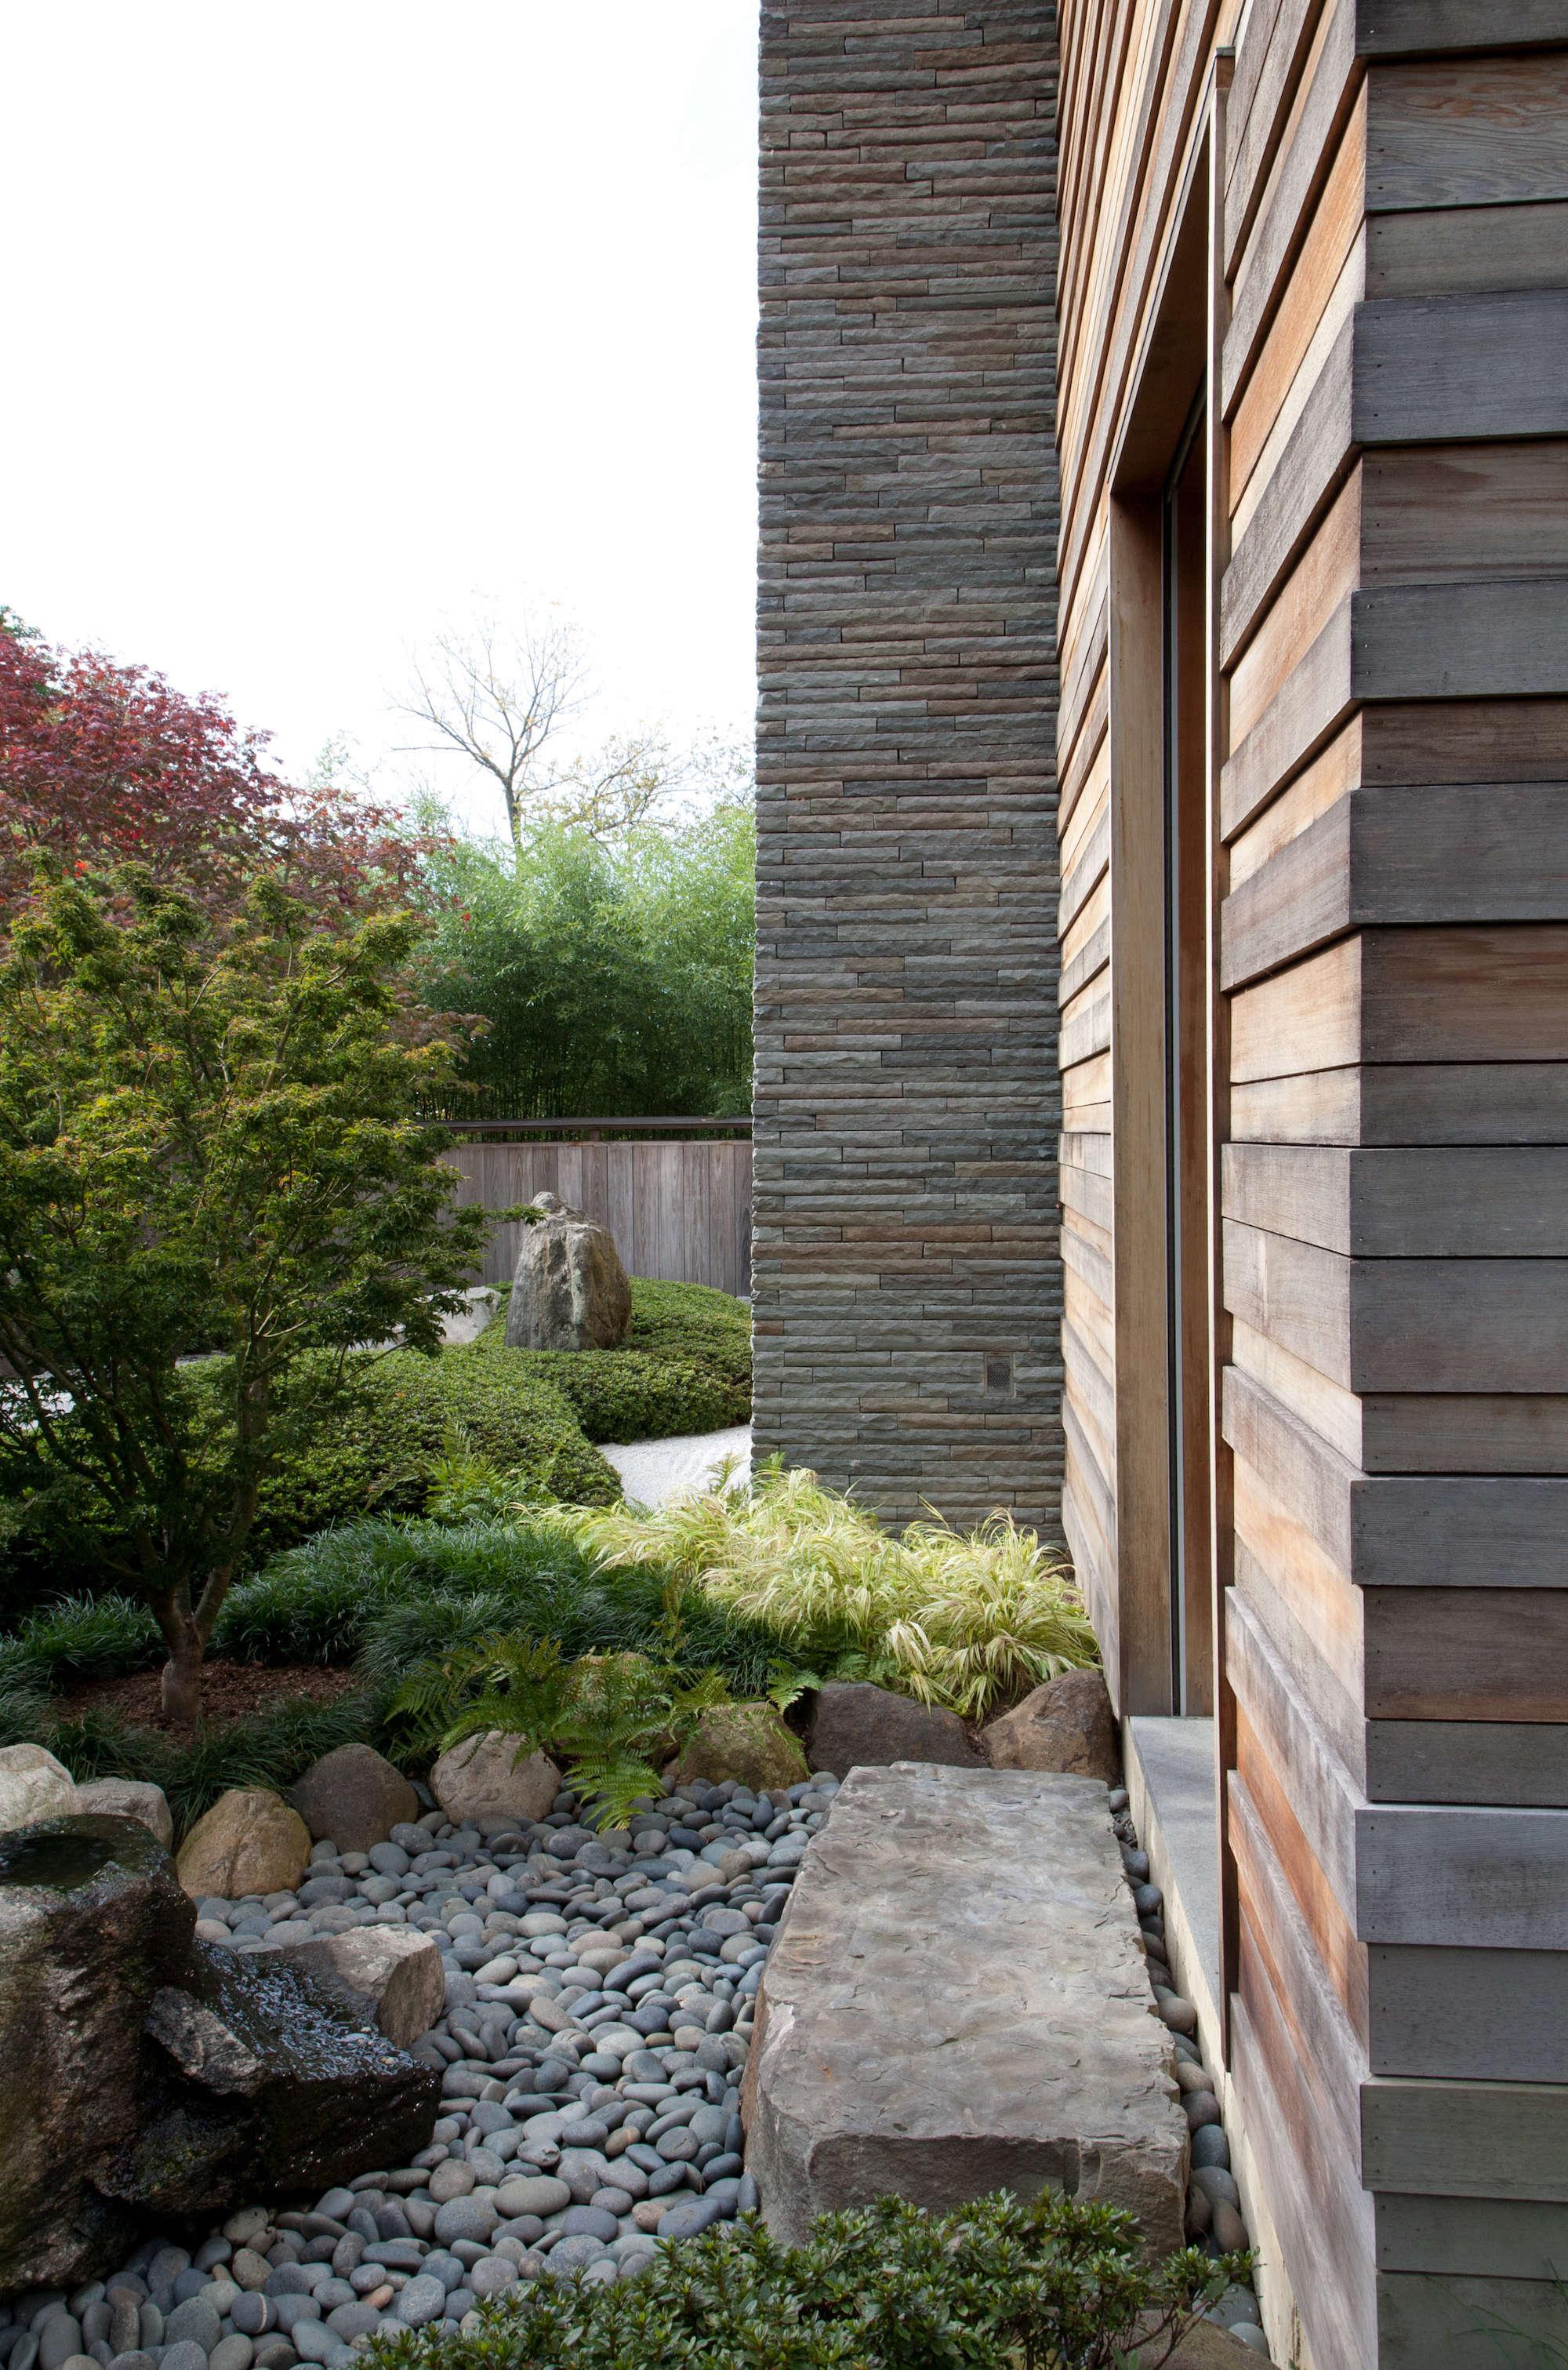 Designer Visit: A Garden Inspired By Japan, In Westchester